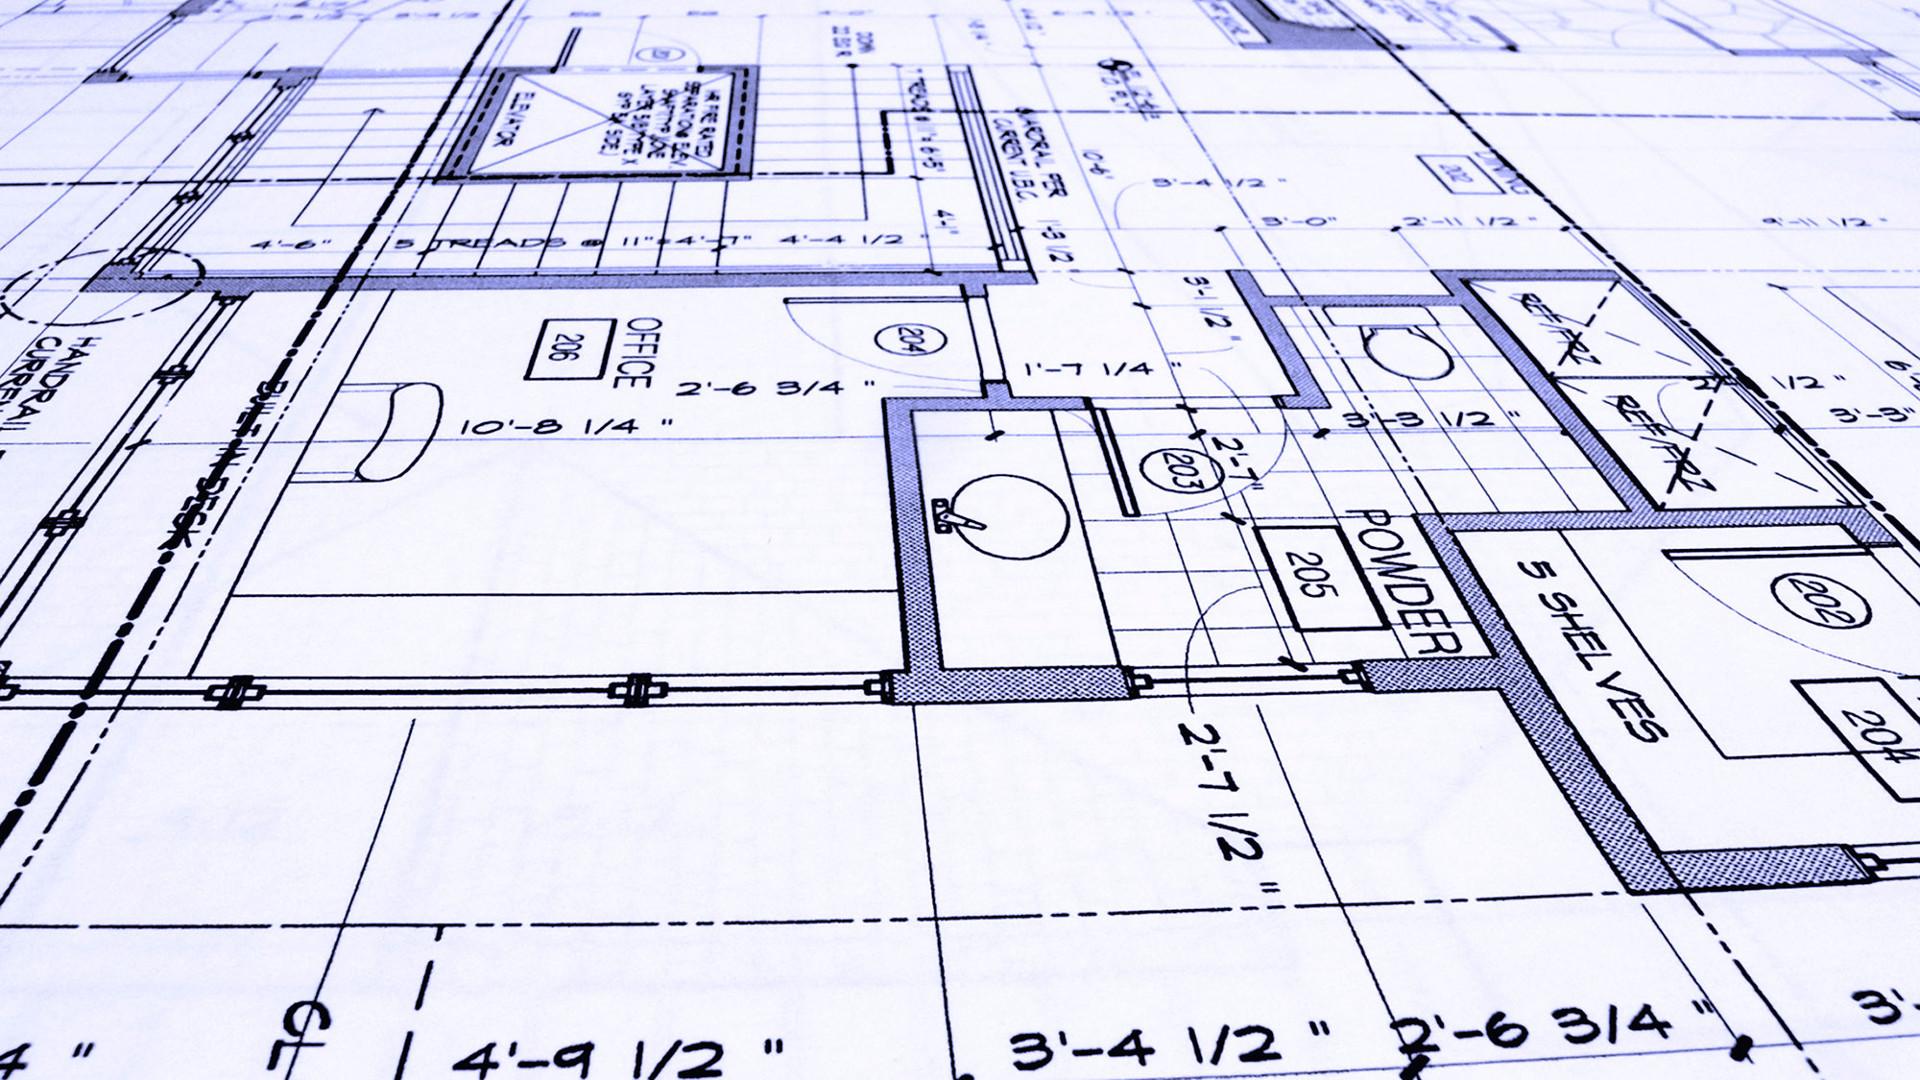 Background Property Developments : Greenwich home builder